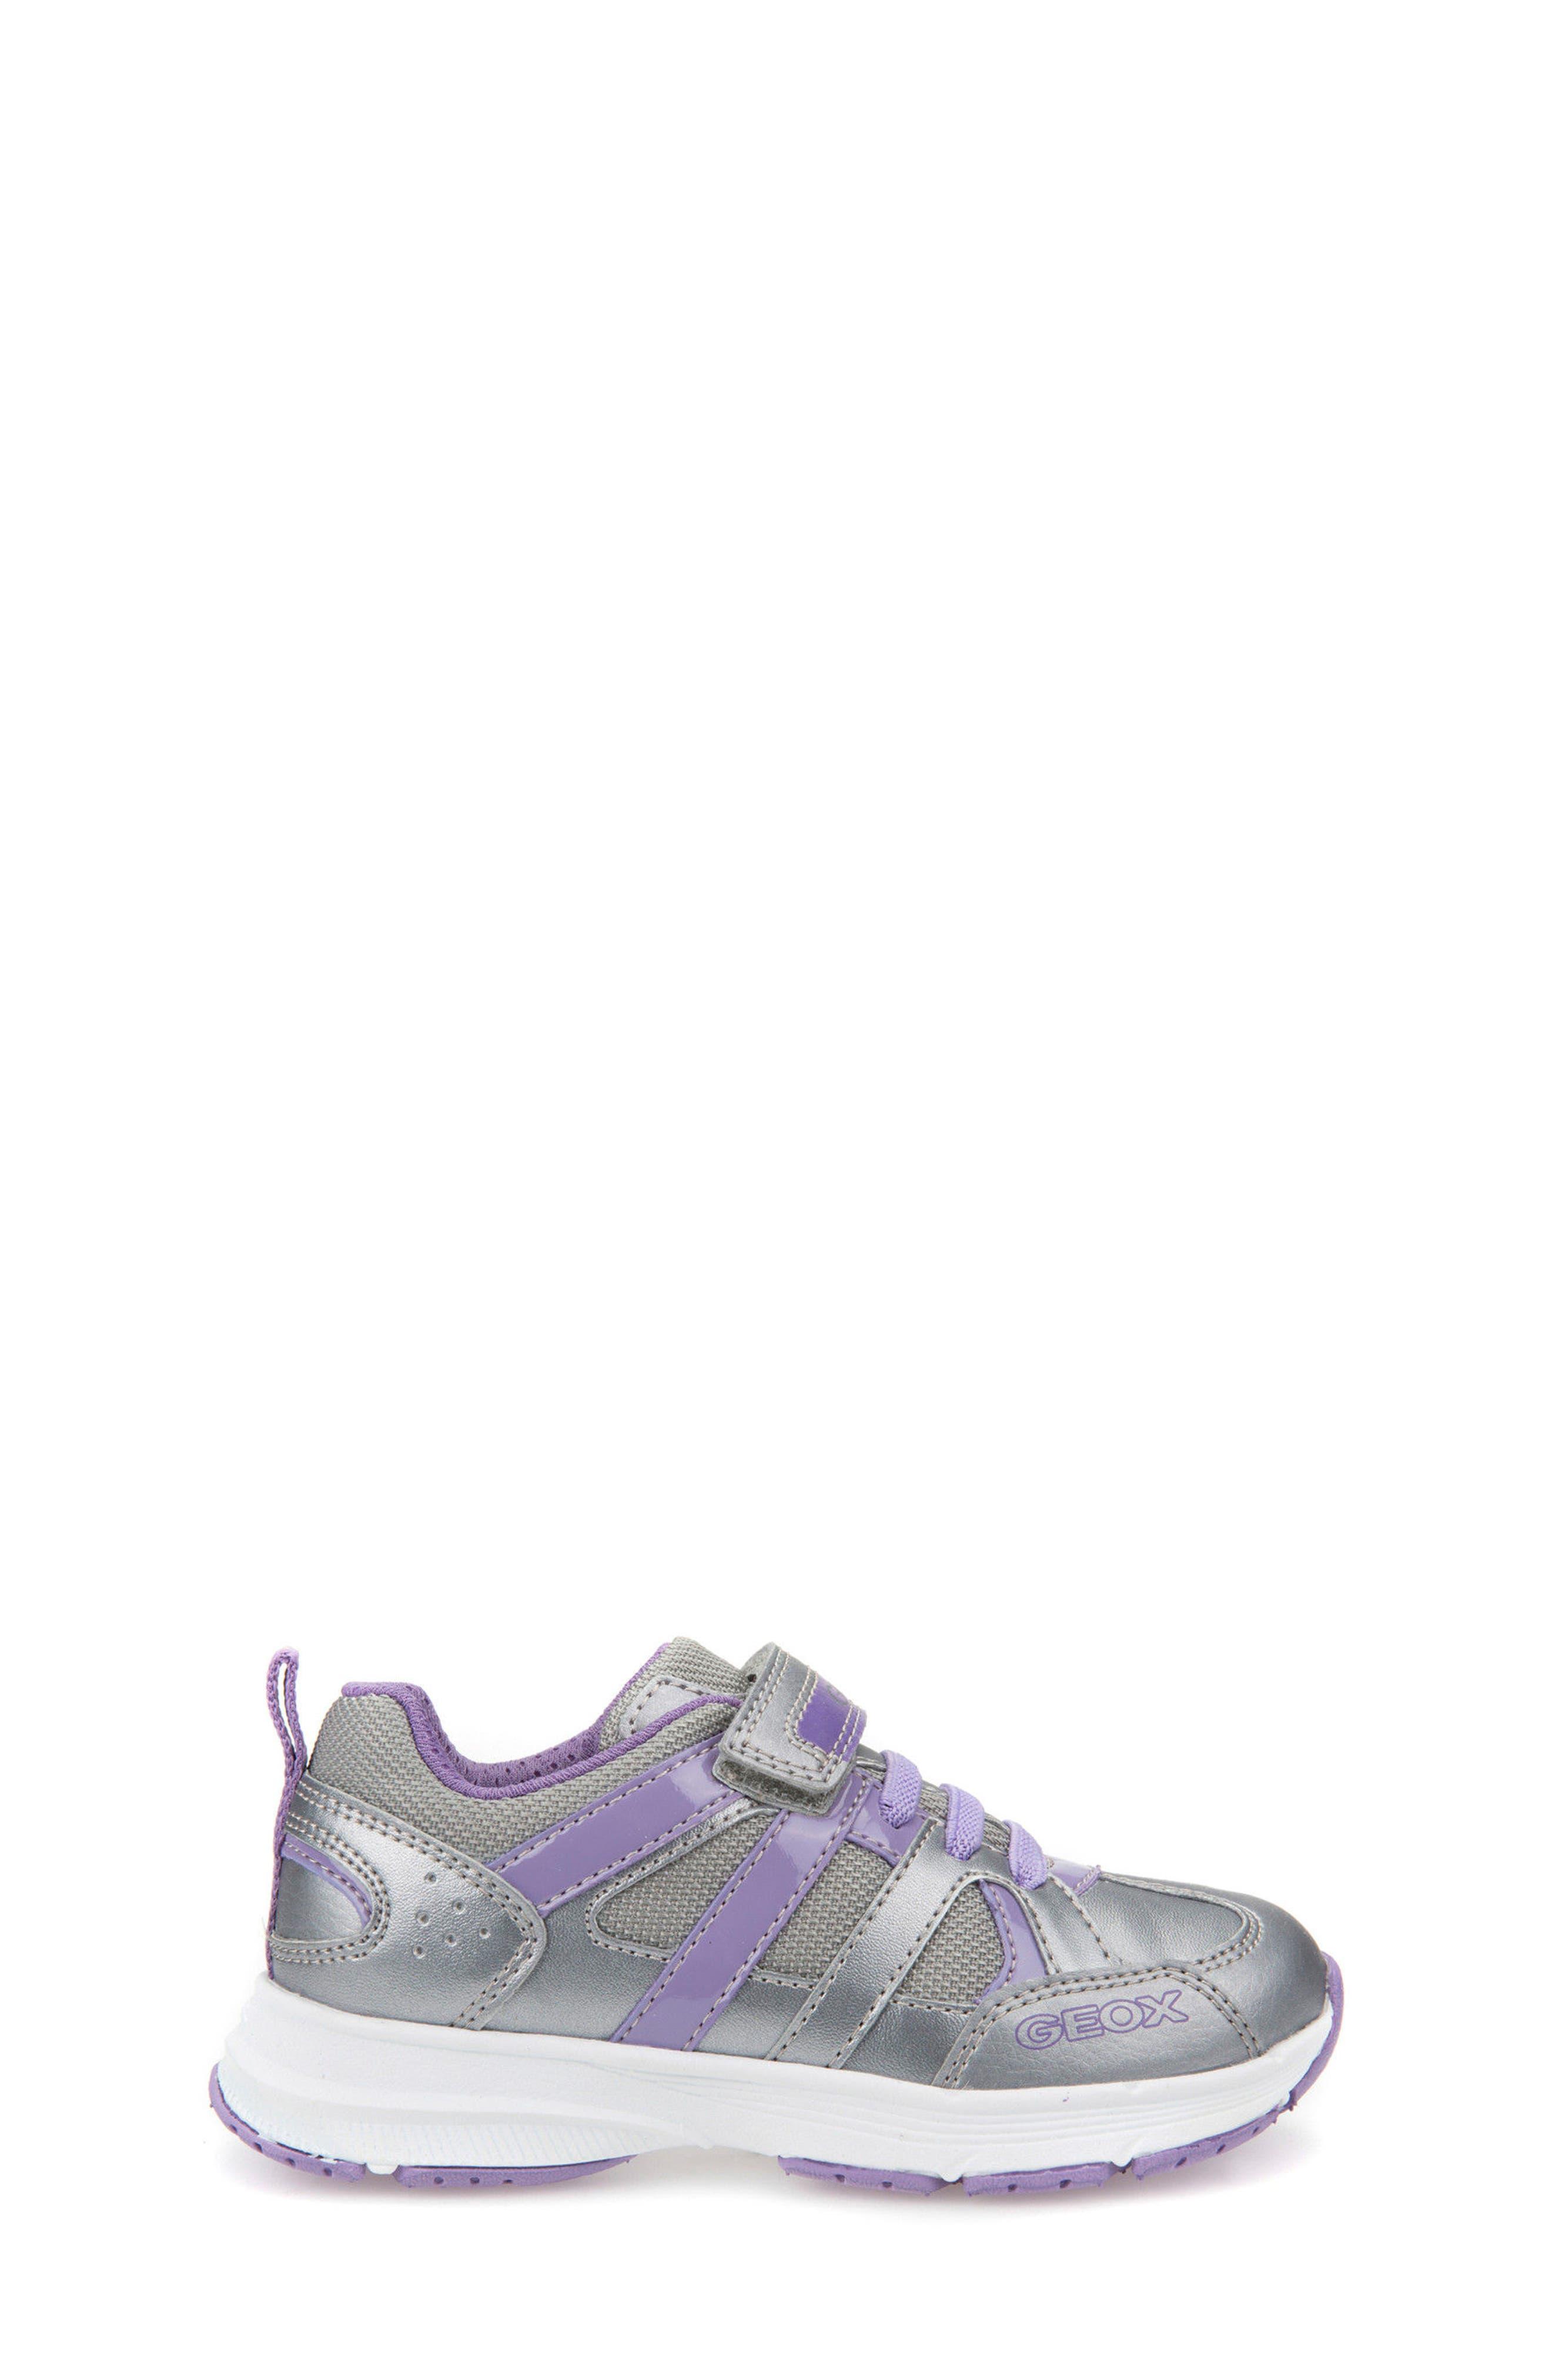 Top Fly Sneaker,                             Alternate thumbnail 3, color,                             040